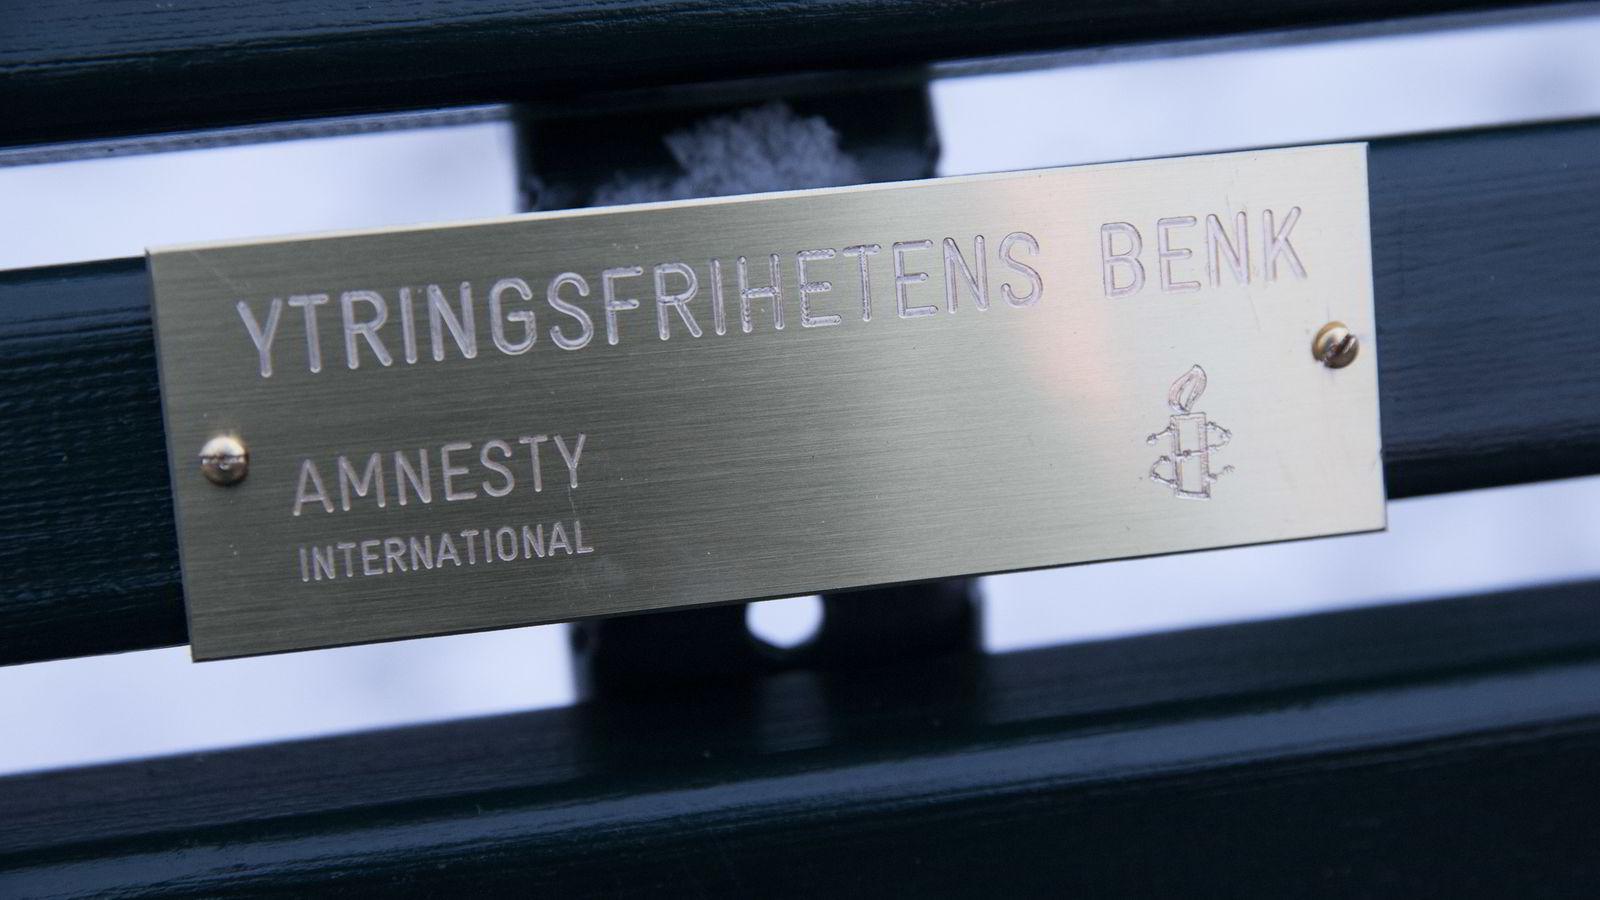 Benken utenfor Saudi-Arabias ambassade. Foto: Håkon Mosvold Larsen /